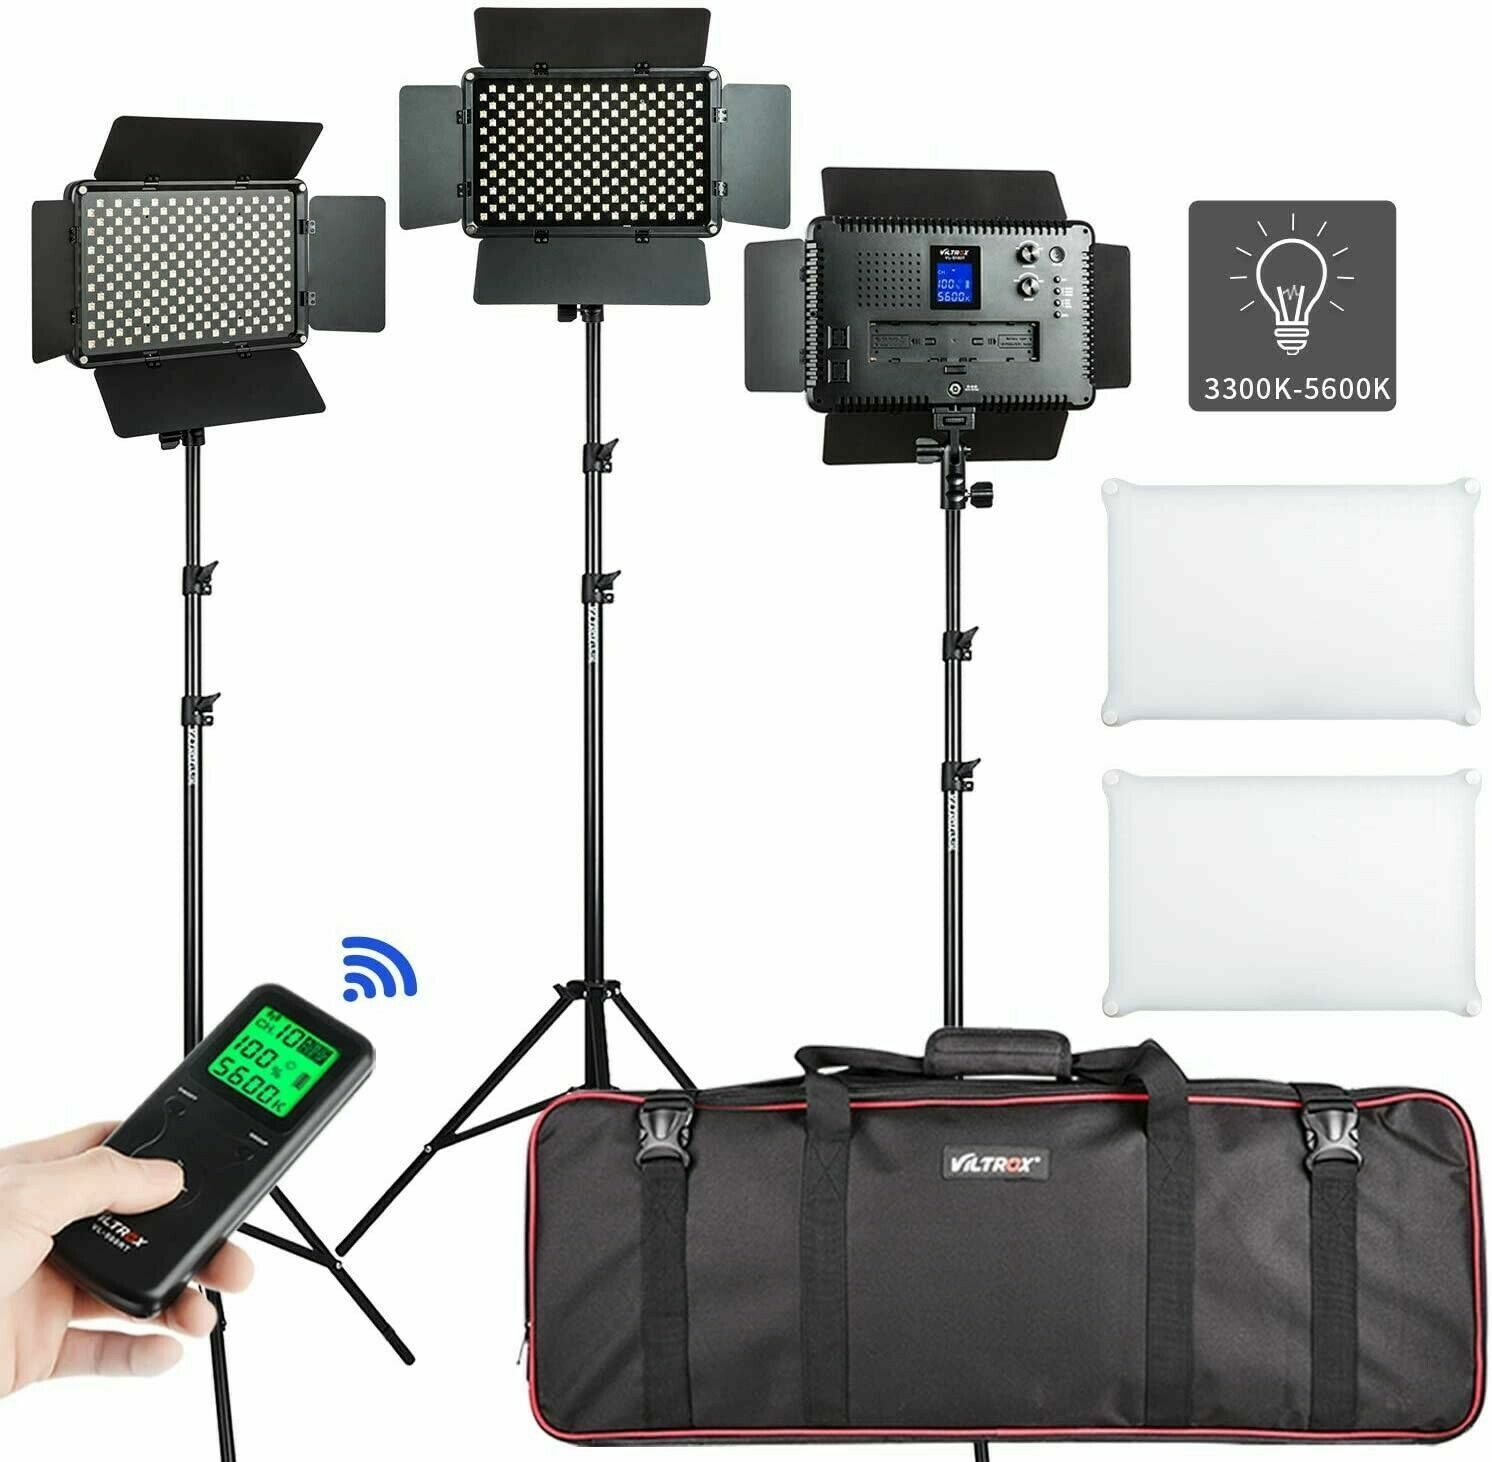 VILROX VL-S192T 50W Bi-color LED Video Light Lamp Kit +Wireless Remote+Stand